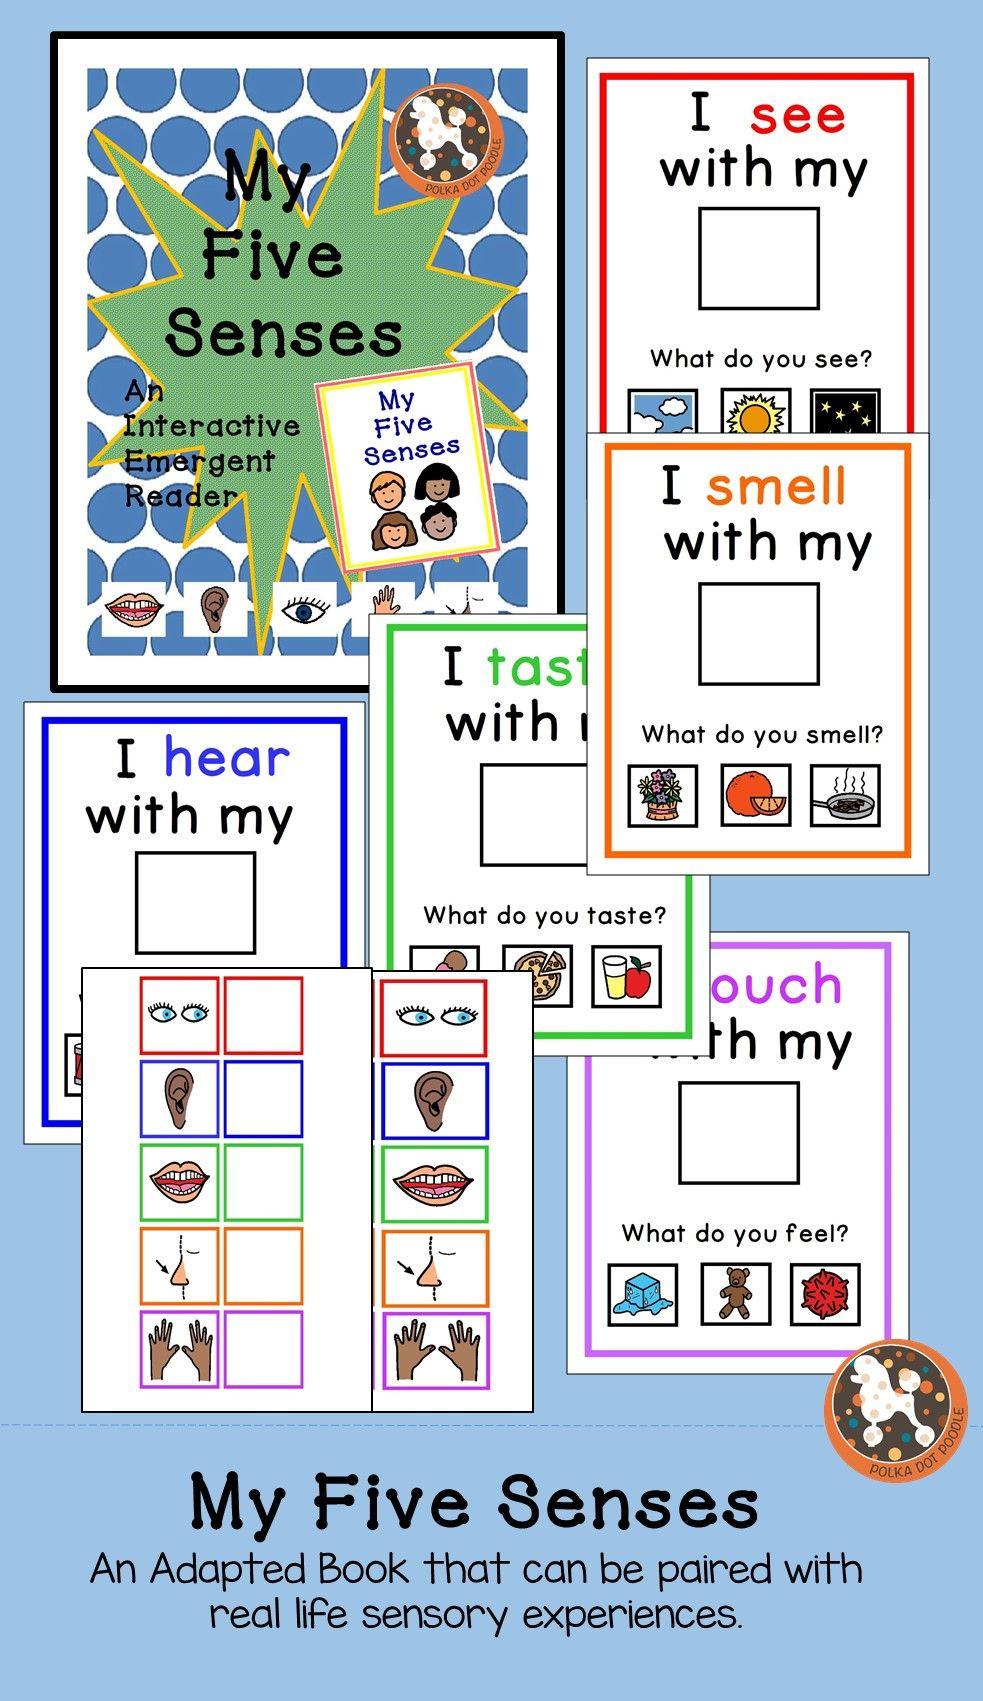 My 5 Senses Interactive Emergent Reader With Boardmaker Symbols